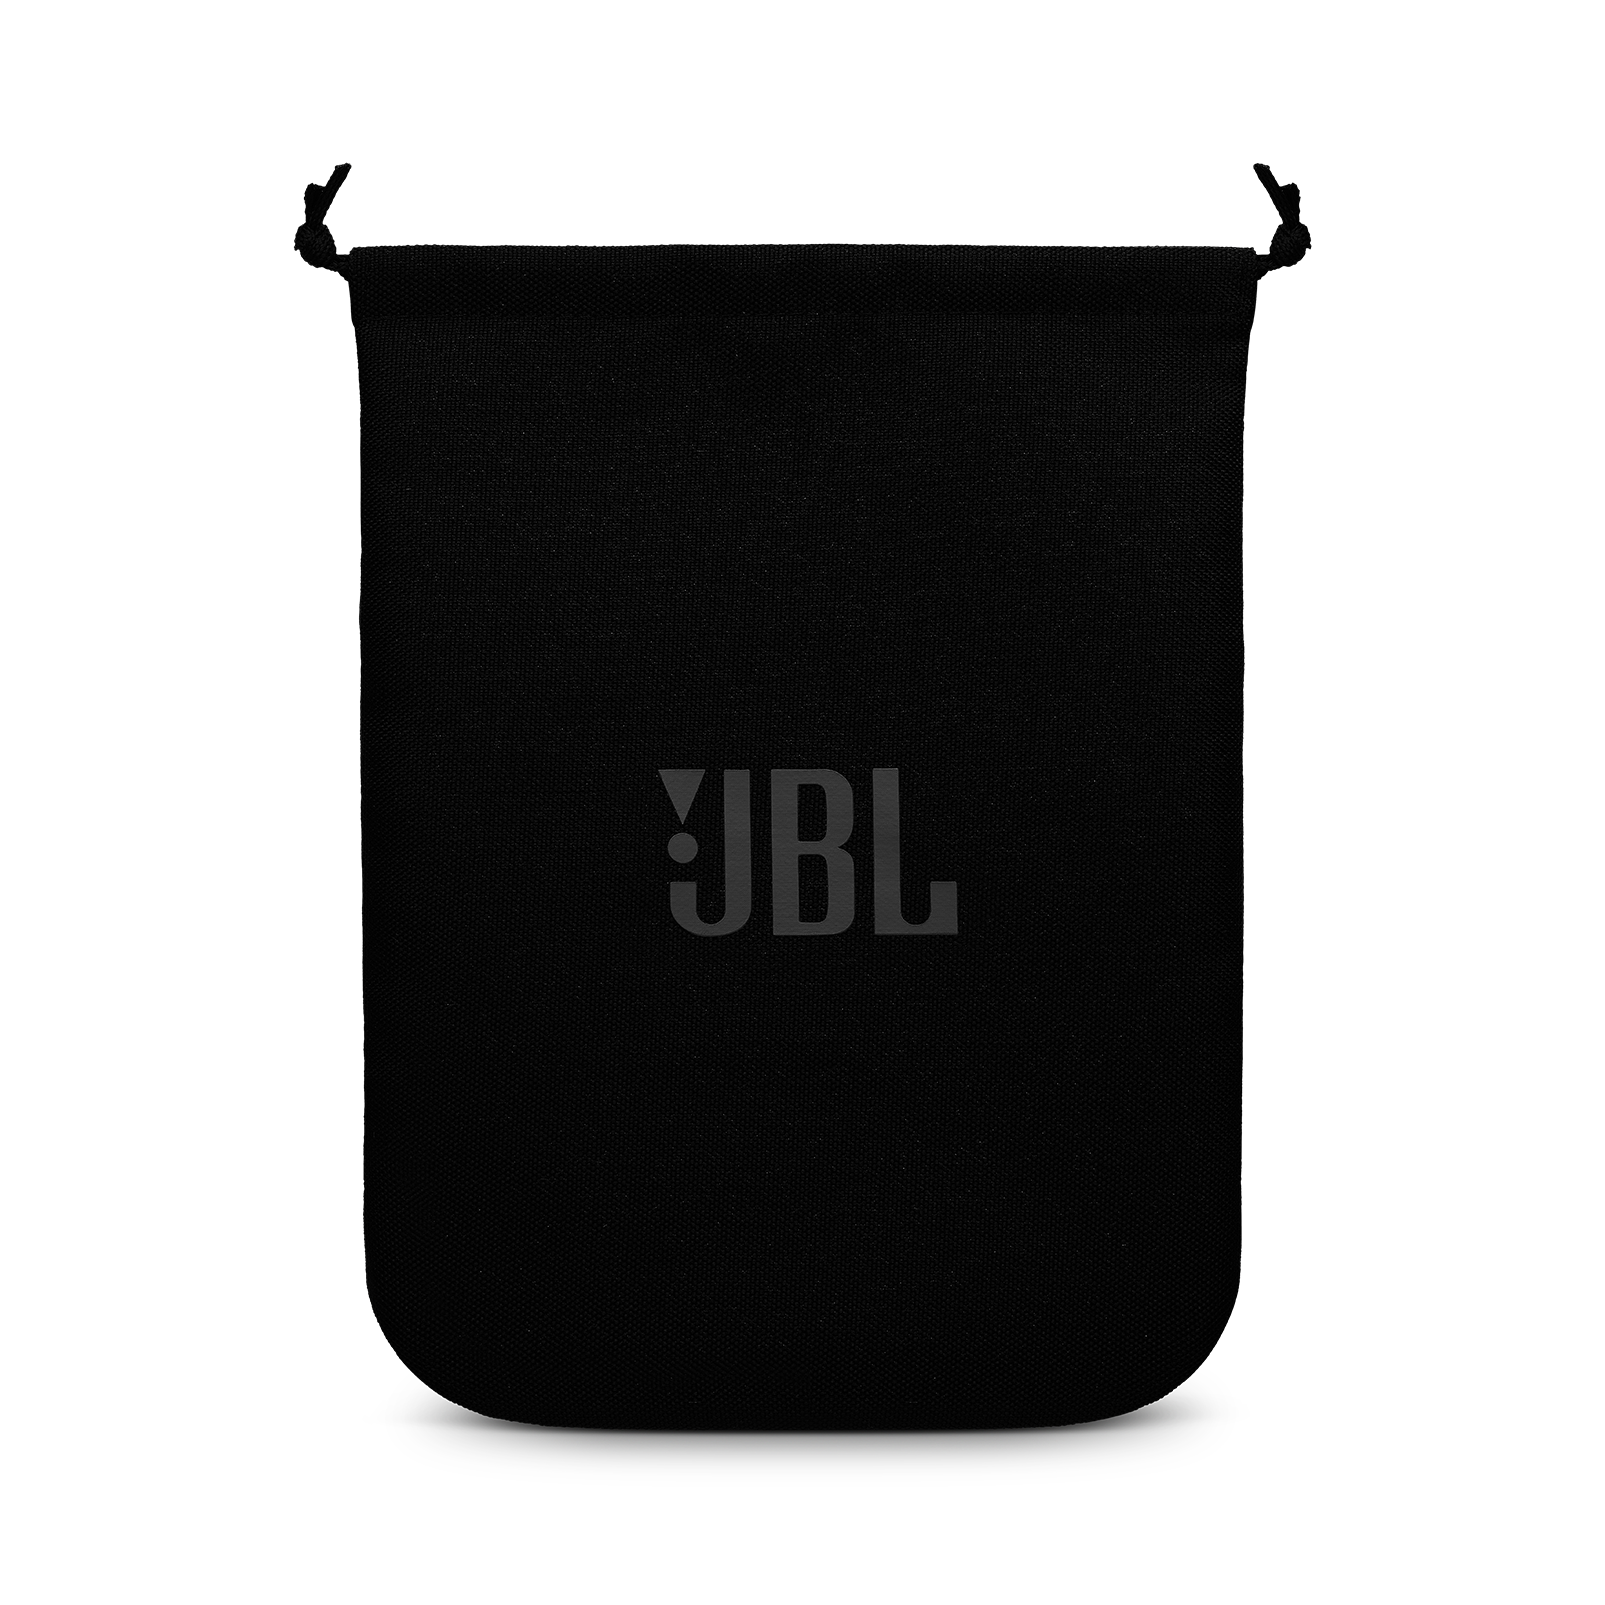 Jbl headphones wireless e65btnc - headphones pouch jbl